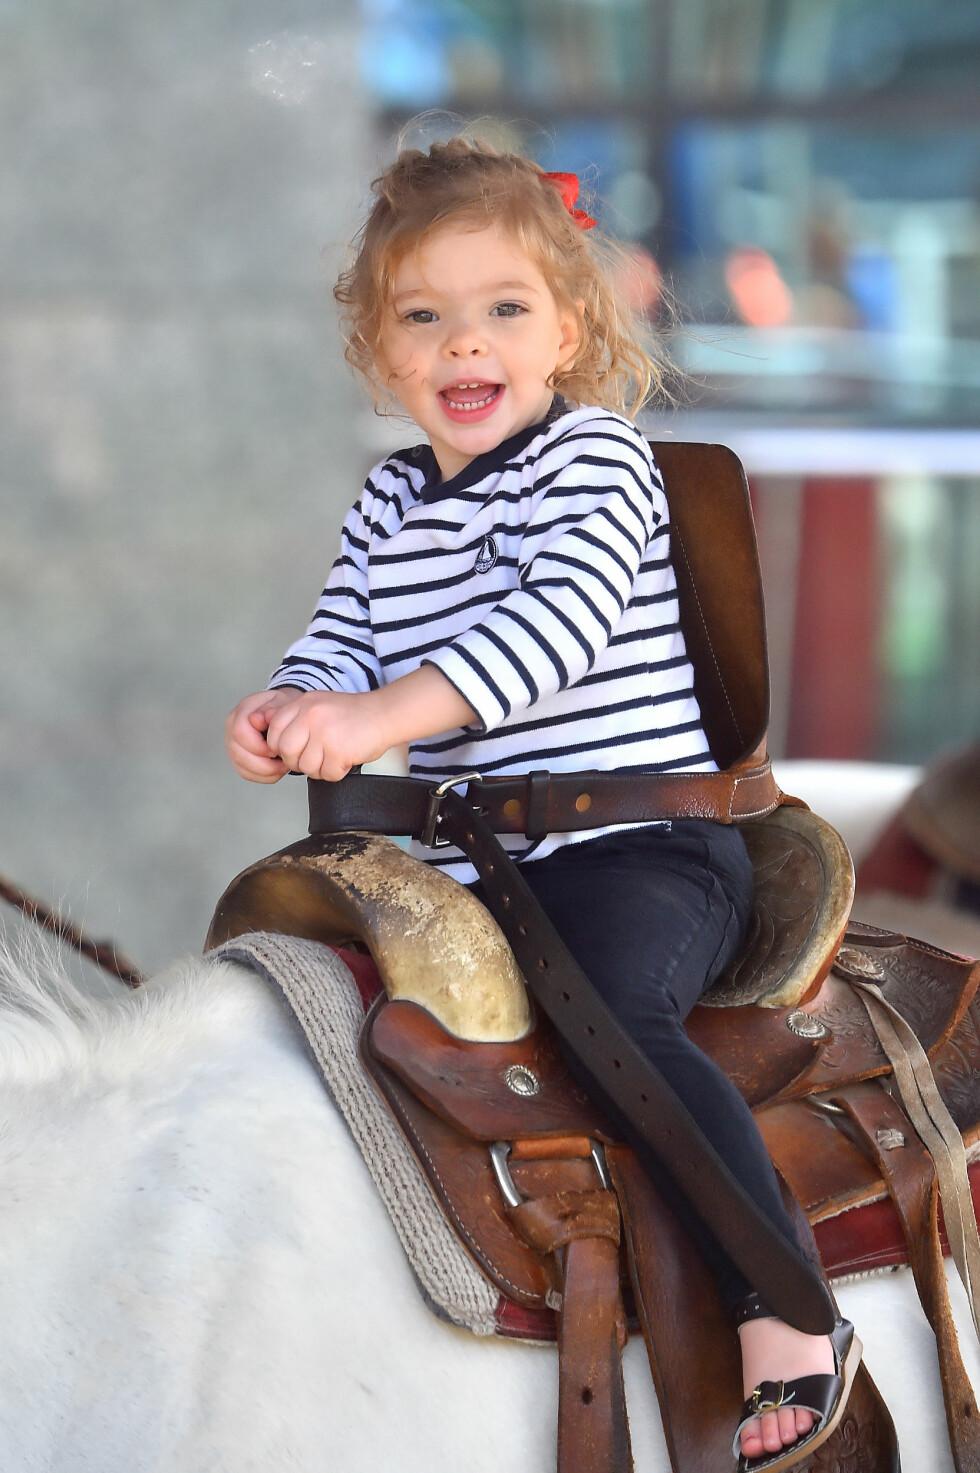 <strong>HJERTEKNUSER:</strong> Barrymores eldste datter Olive koser seg på hesteryggen i en park i Los Angeles. Foto: Splash News